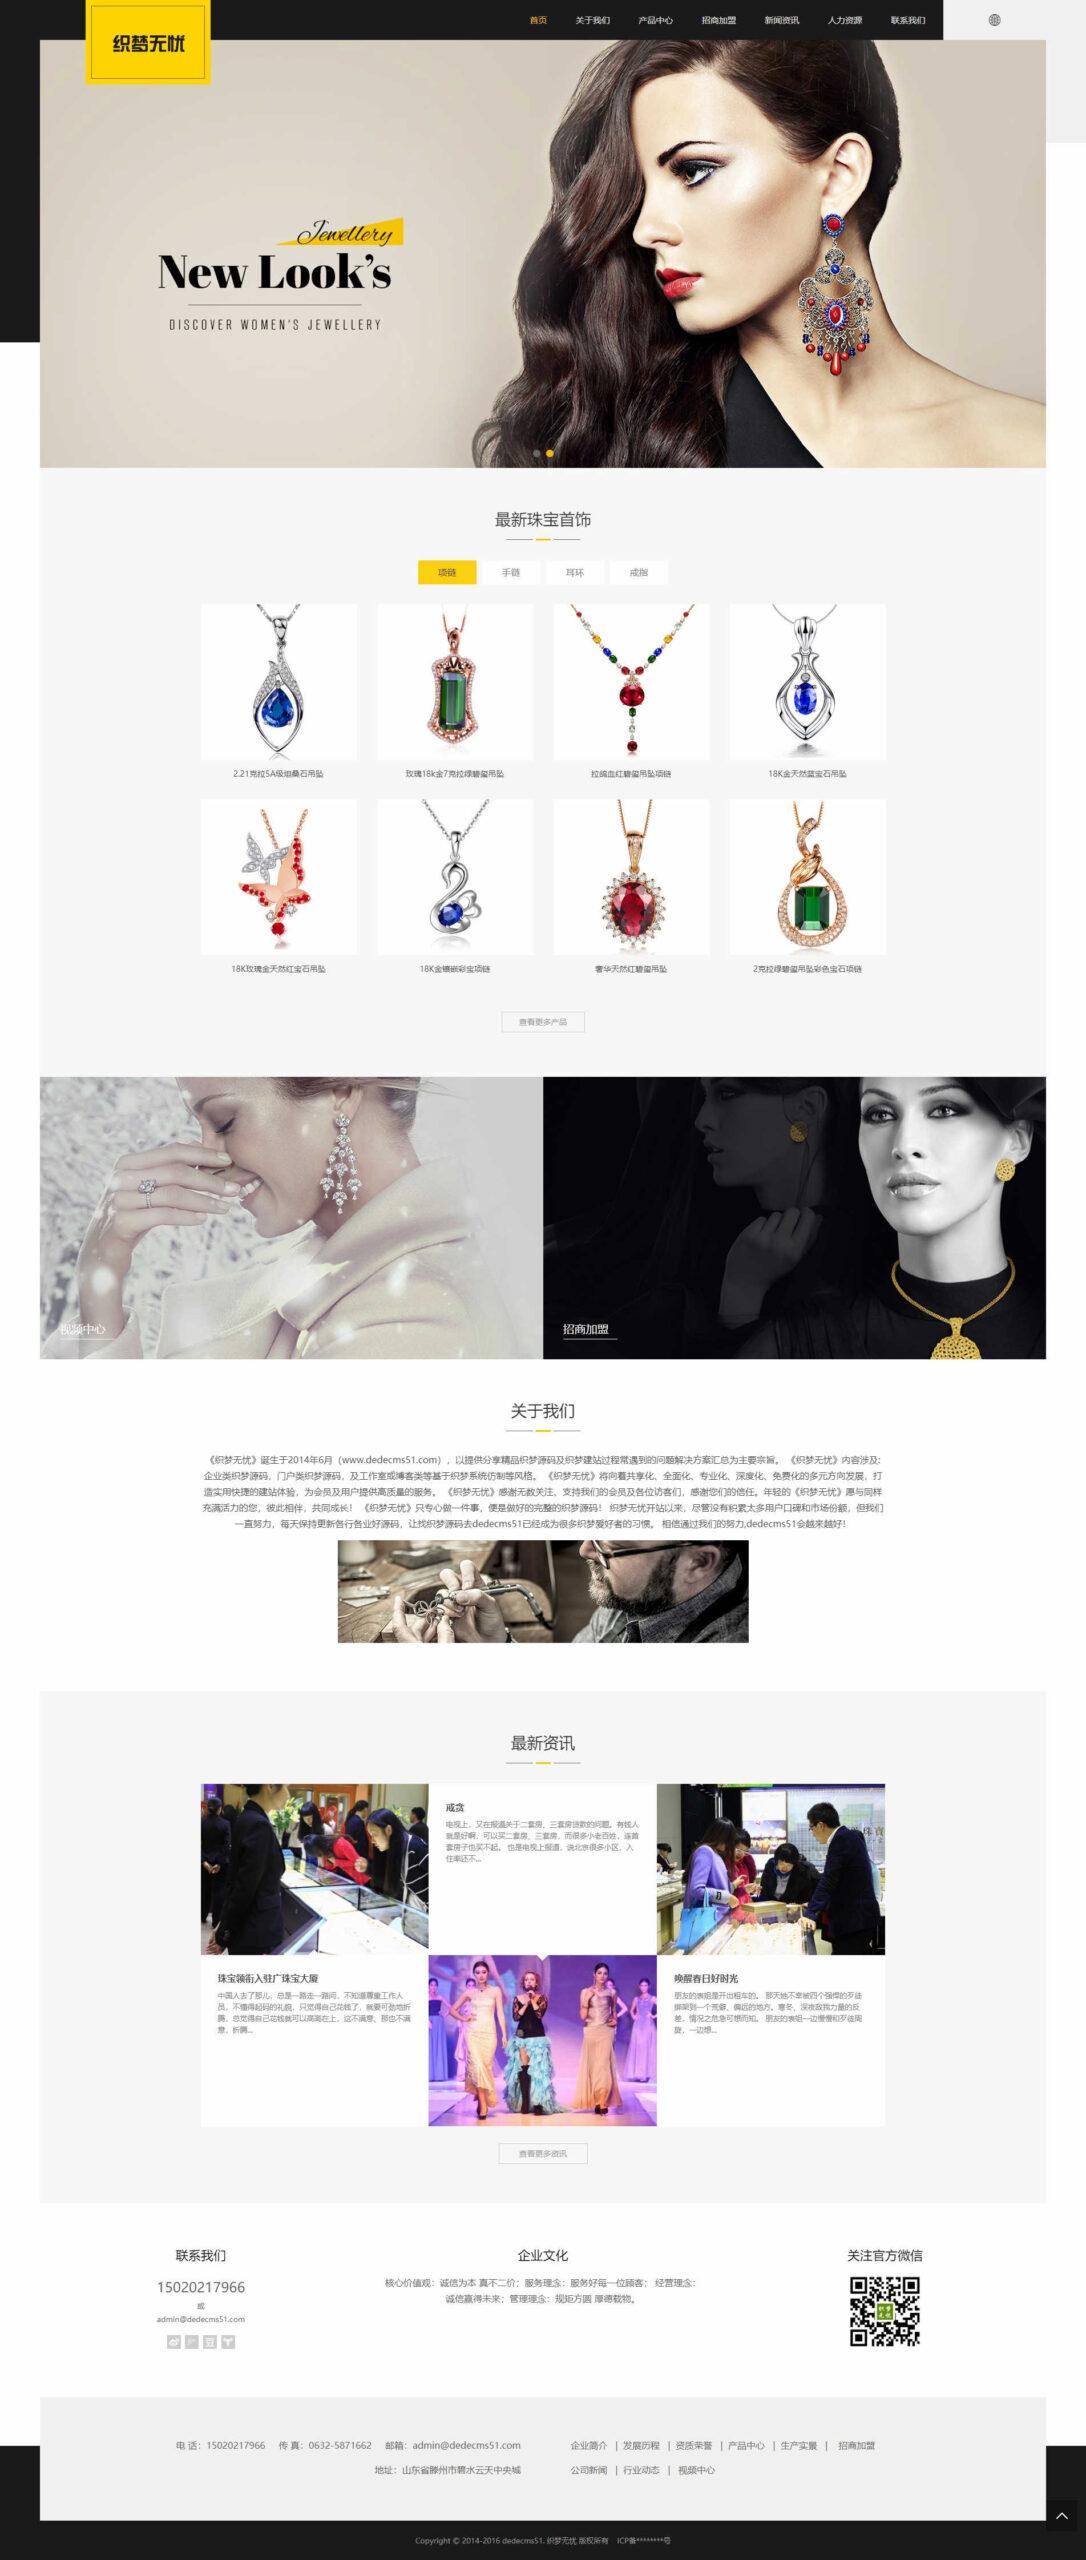 D110织梦dedecms中英双语响应式珠宝网站模板免费下载(自适应手机端)